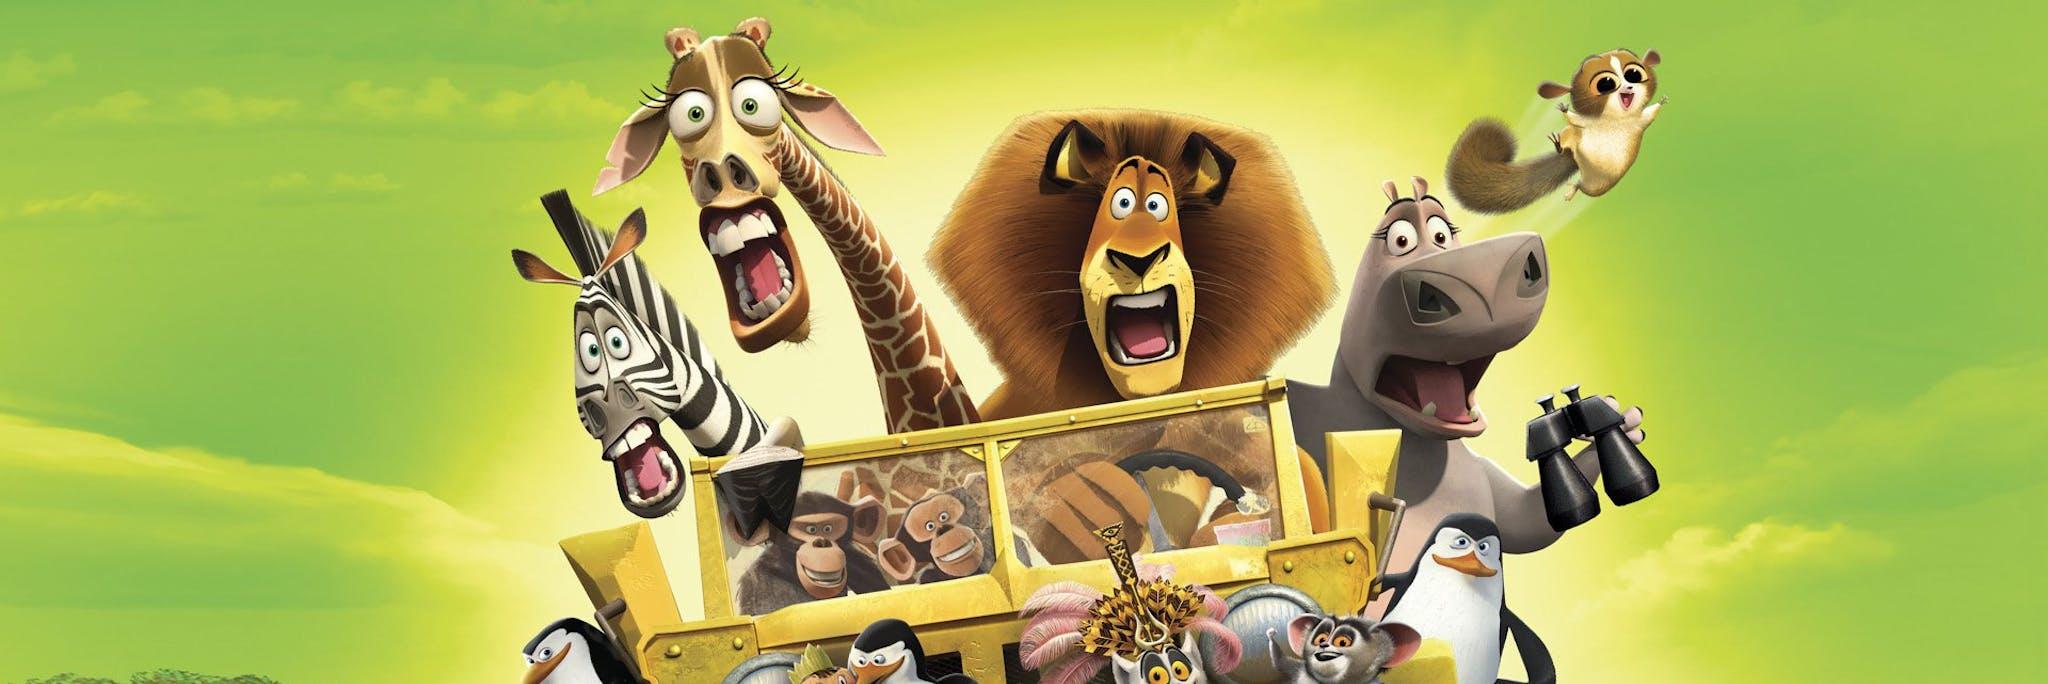 Soundtrack Film Kartun Madagascar Best Faerie Tale Theatre Episodes